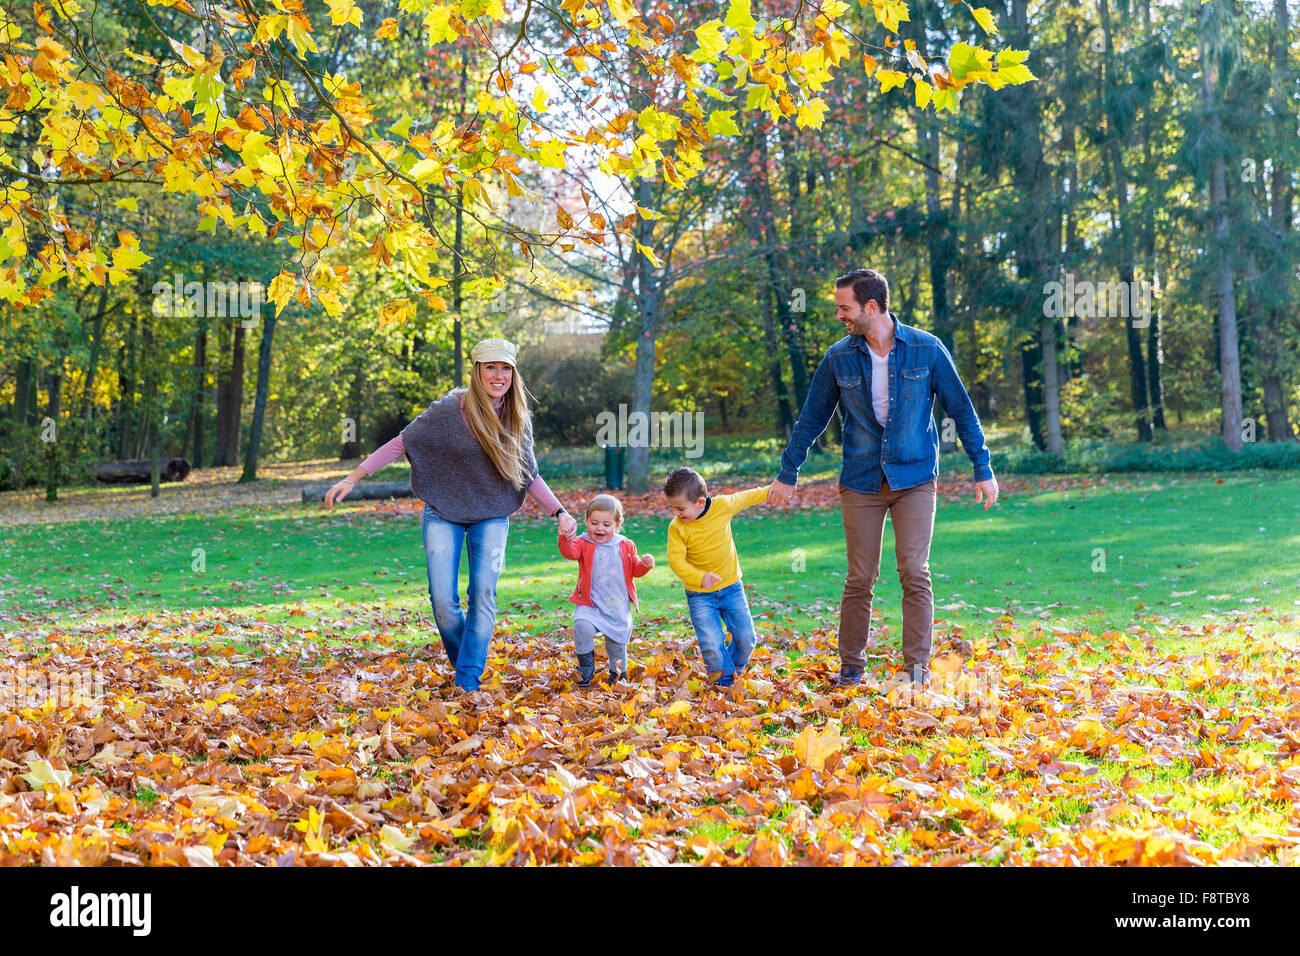 Family walking in park - Stock Image